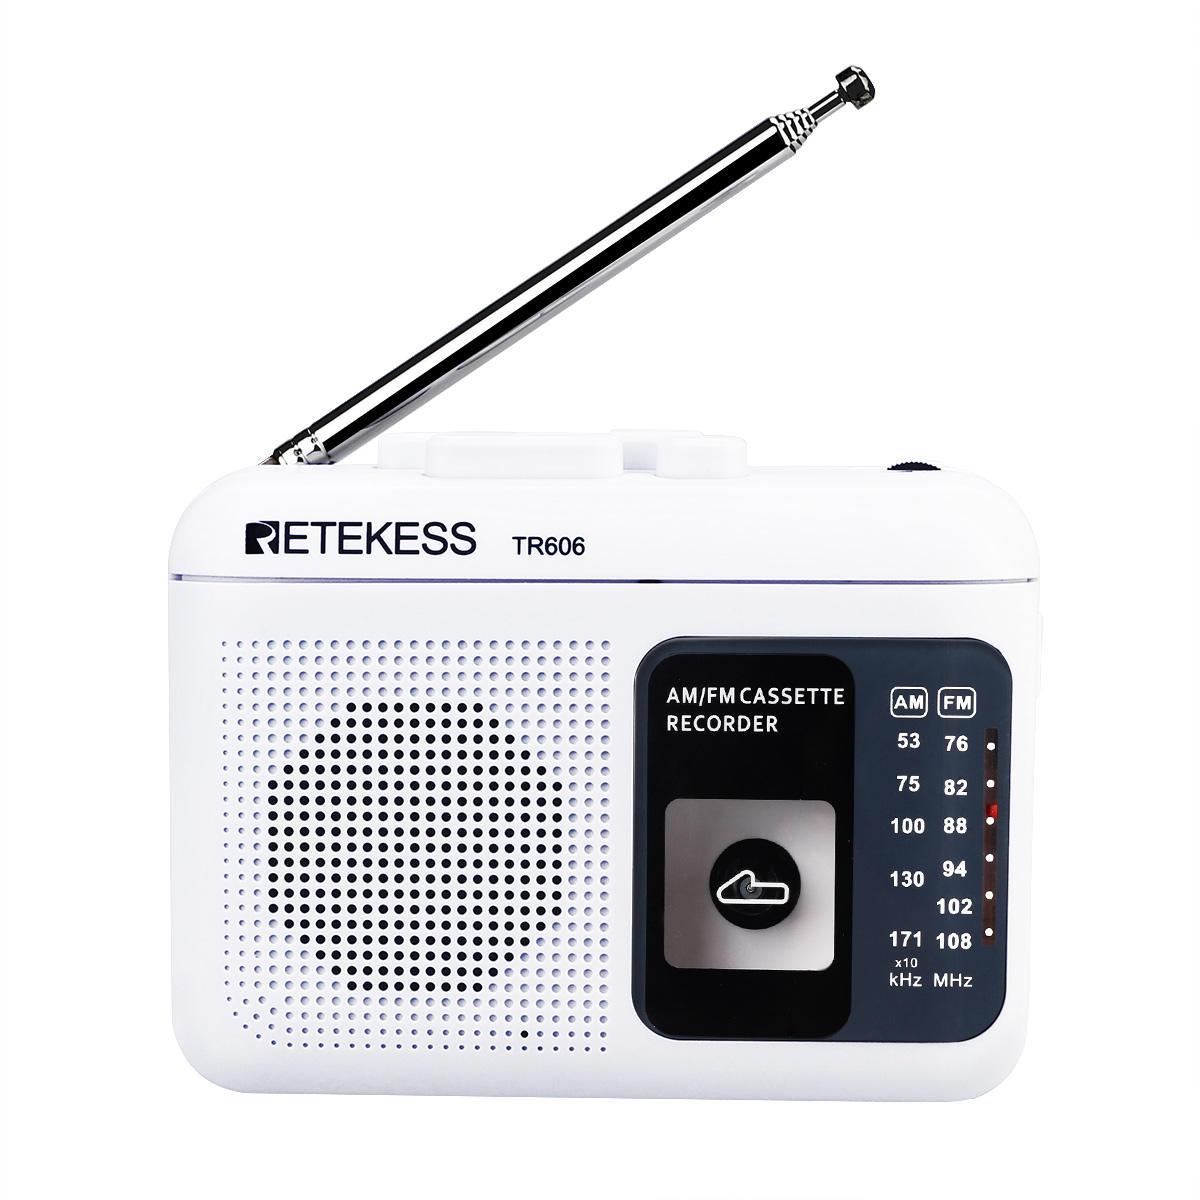 Retekess TR-606 FM AM portátil Radio con grabadora de voz de reproducción de cassette